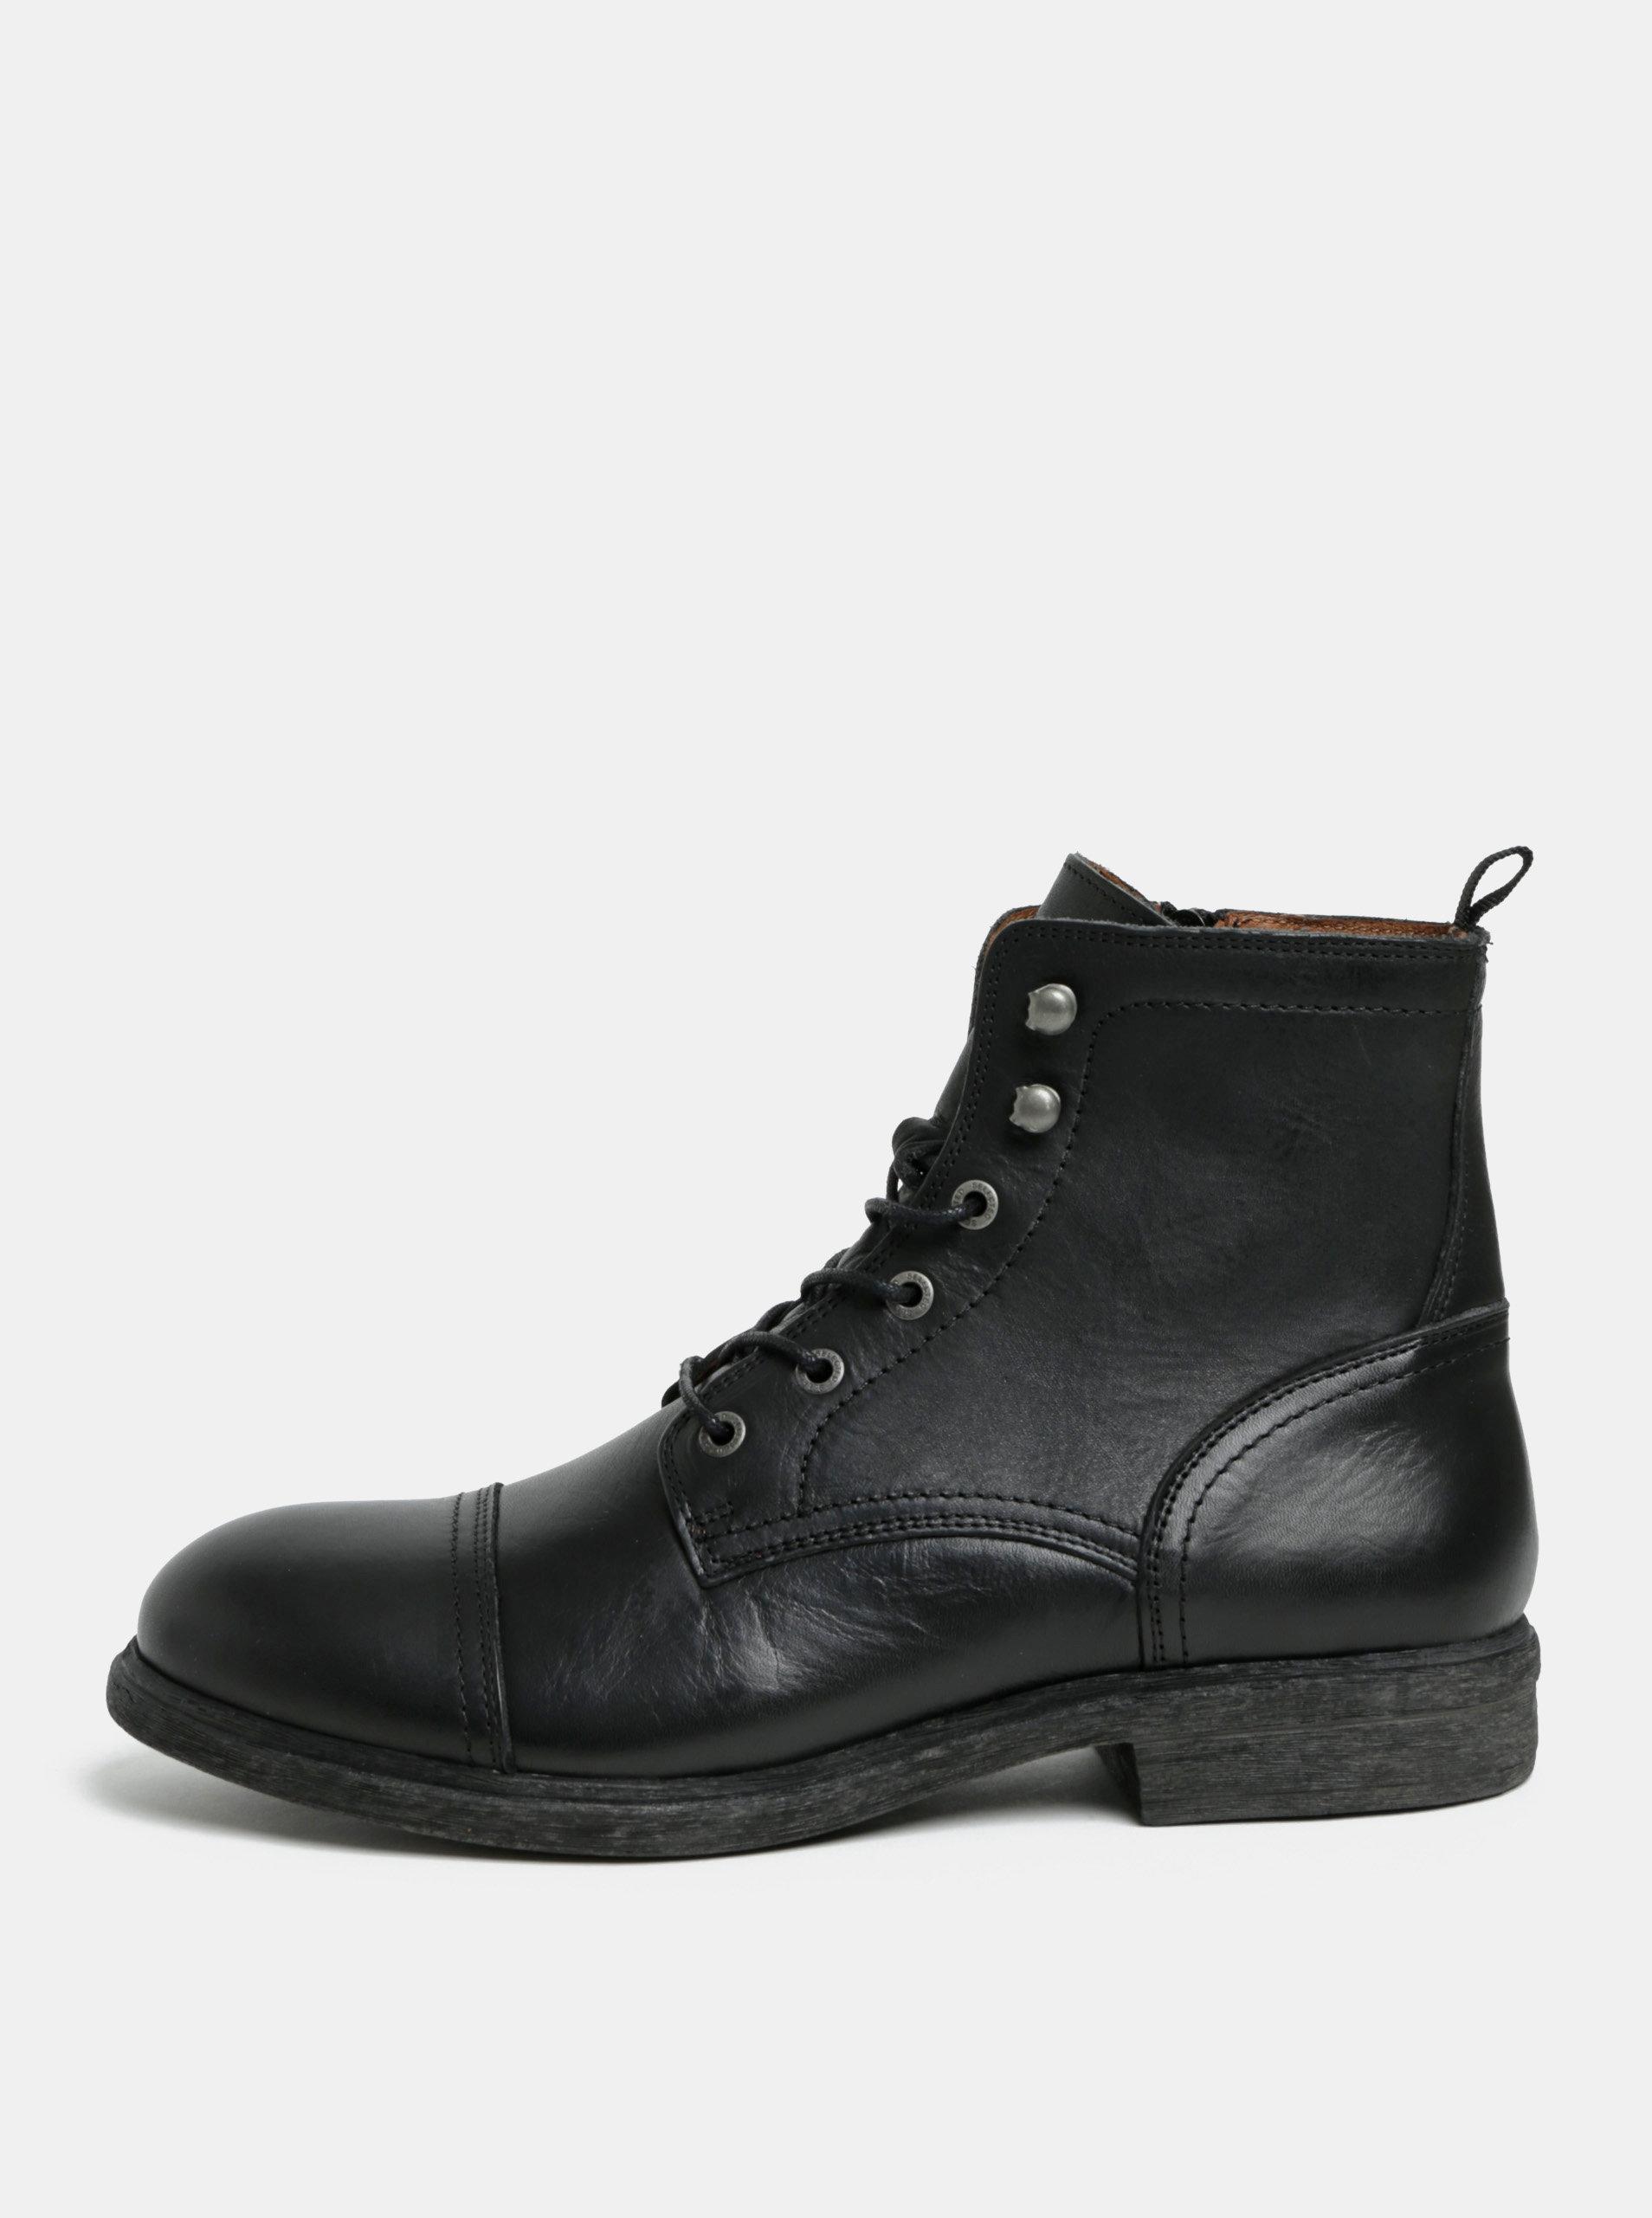 378a5f509c Čierne pánske kožené členkové topánky Selected Homme Therrel ...